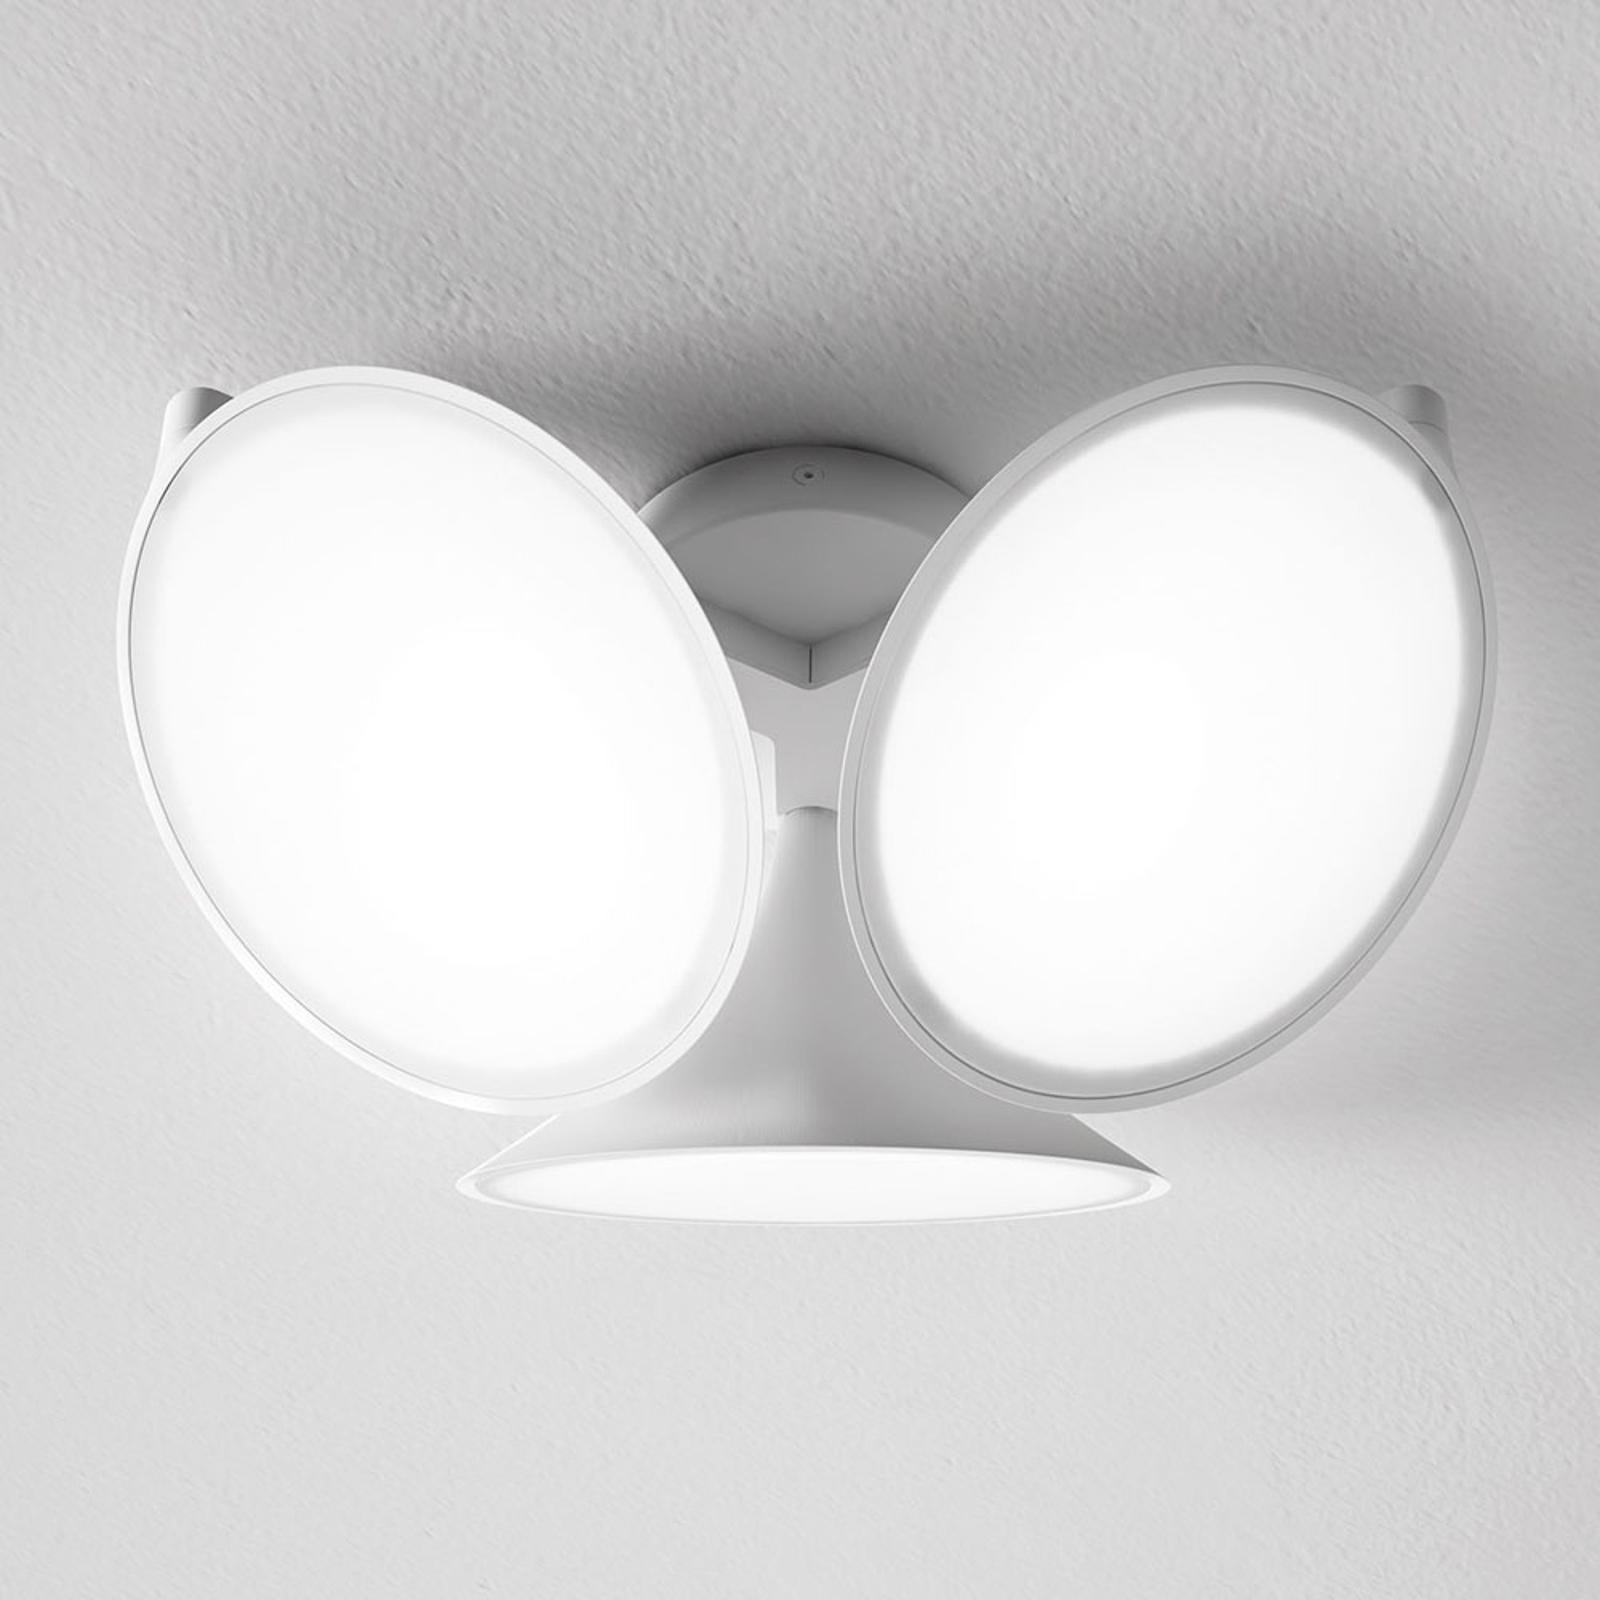 Axolight Orchid lampa sufitowa LED, biała